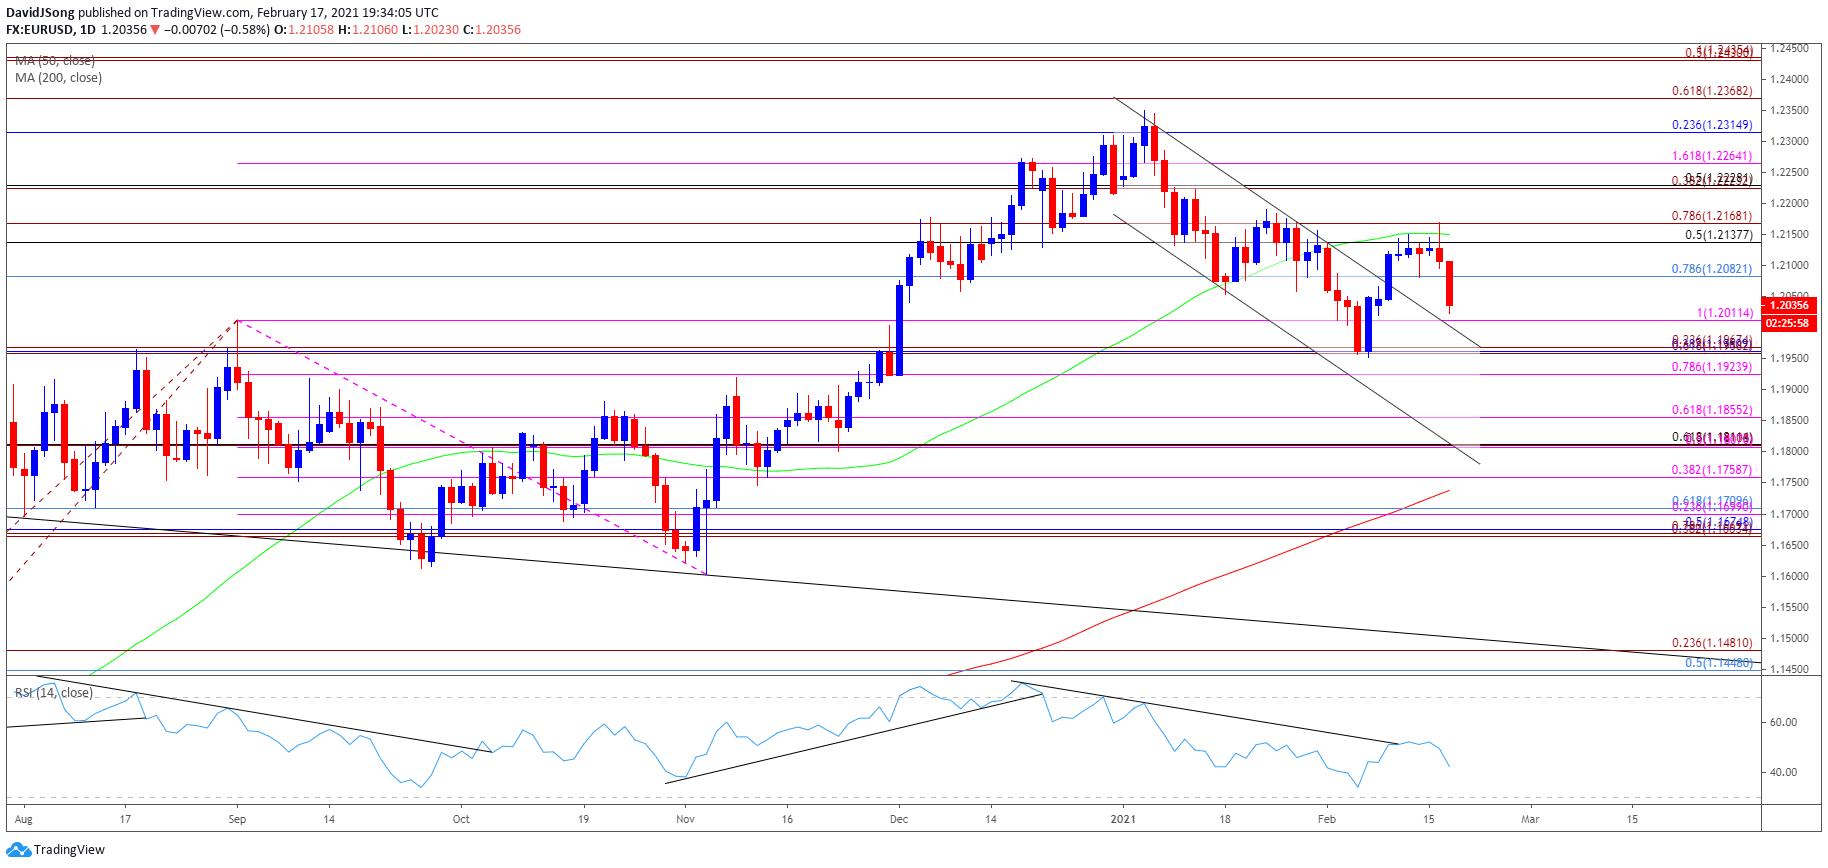 EUR/USD Rate Pullback Emerges